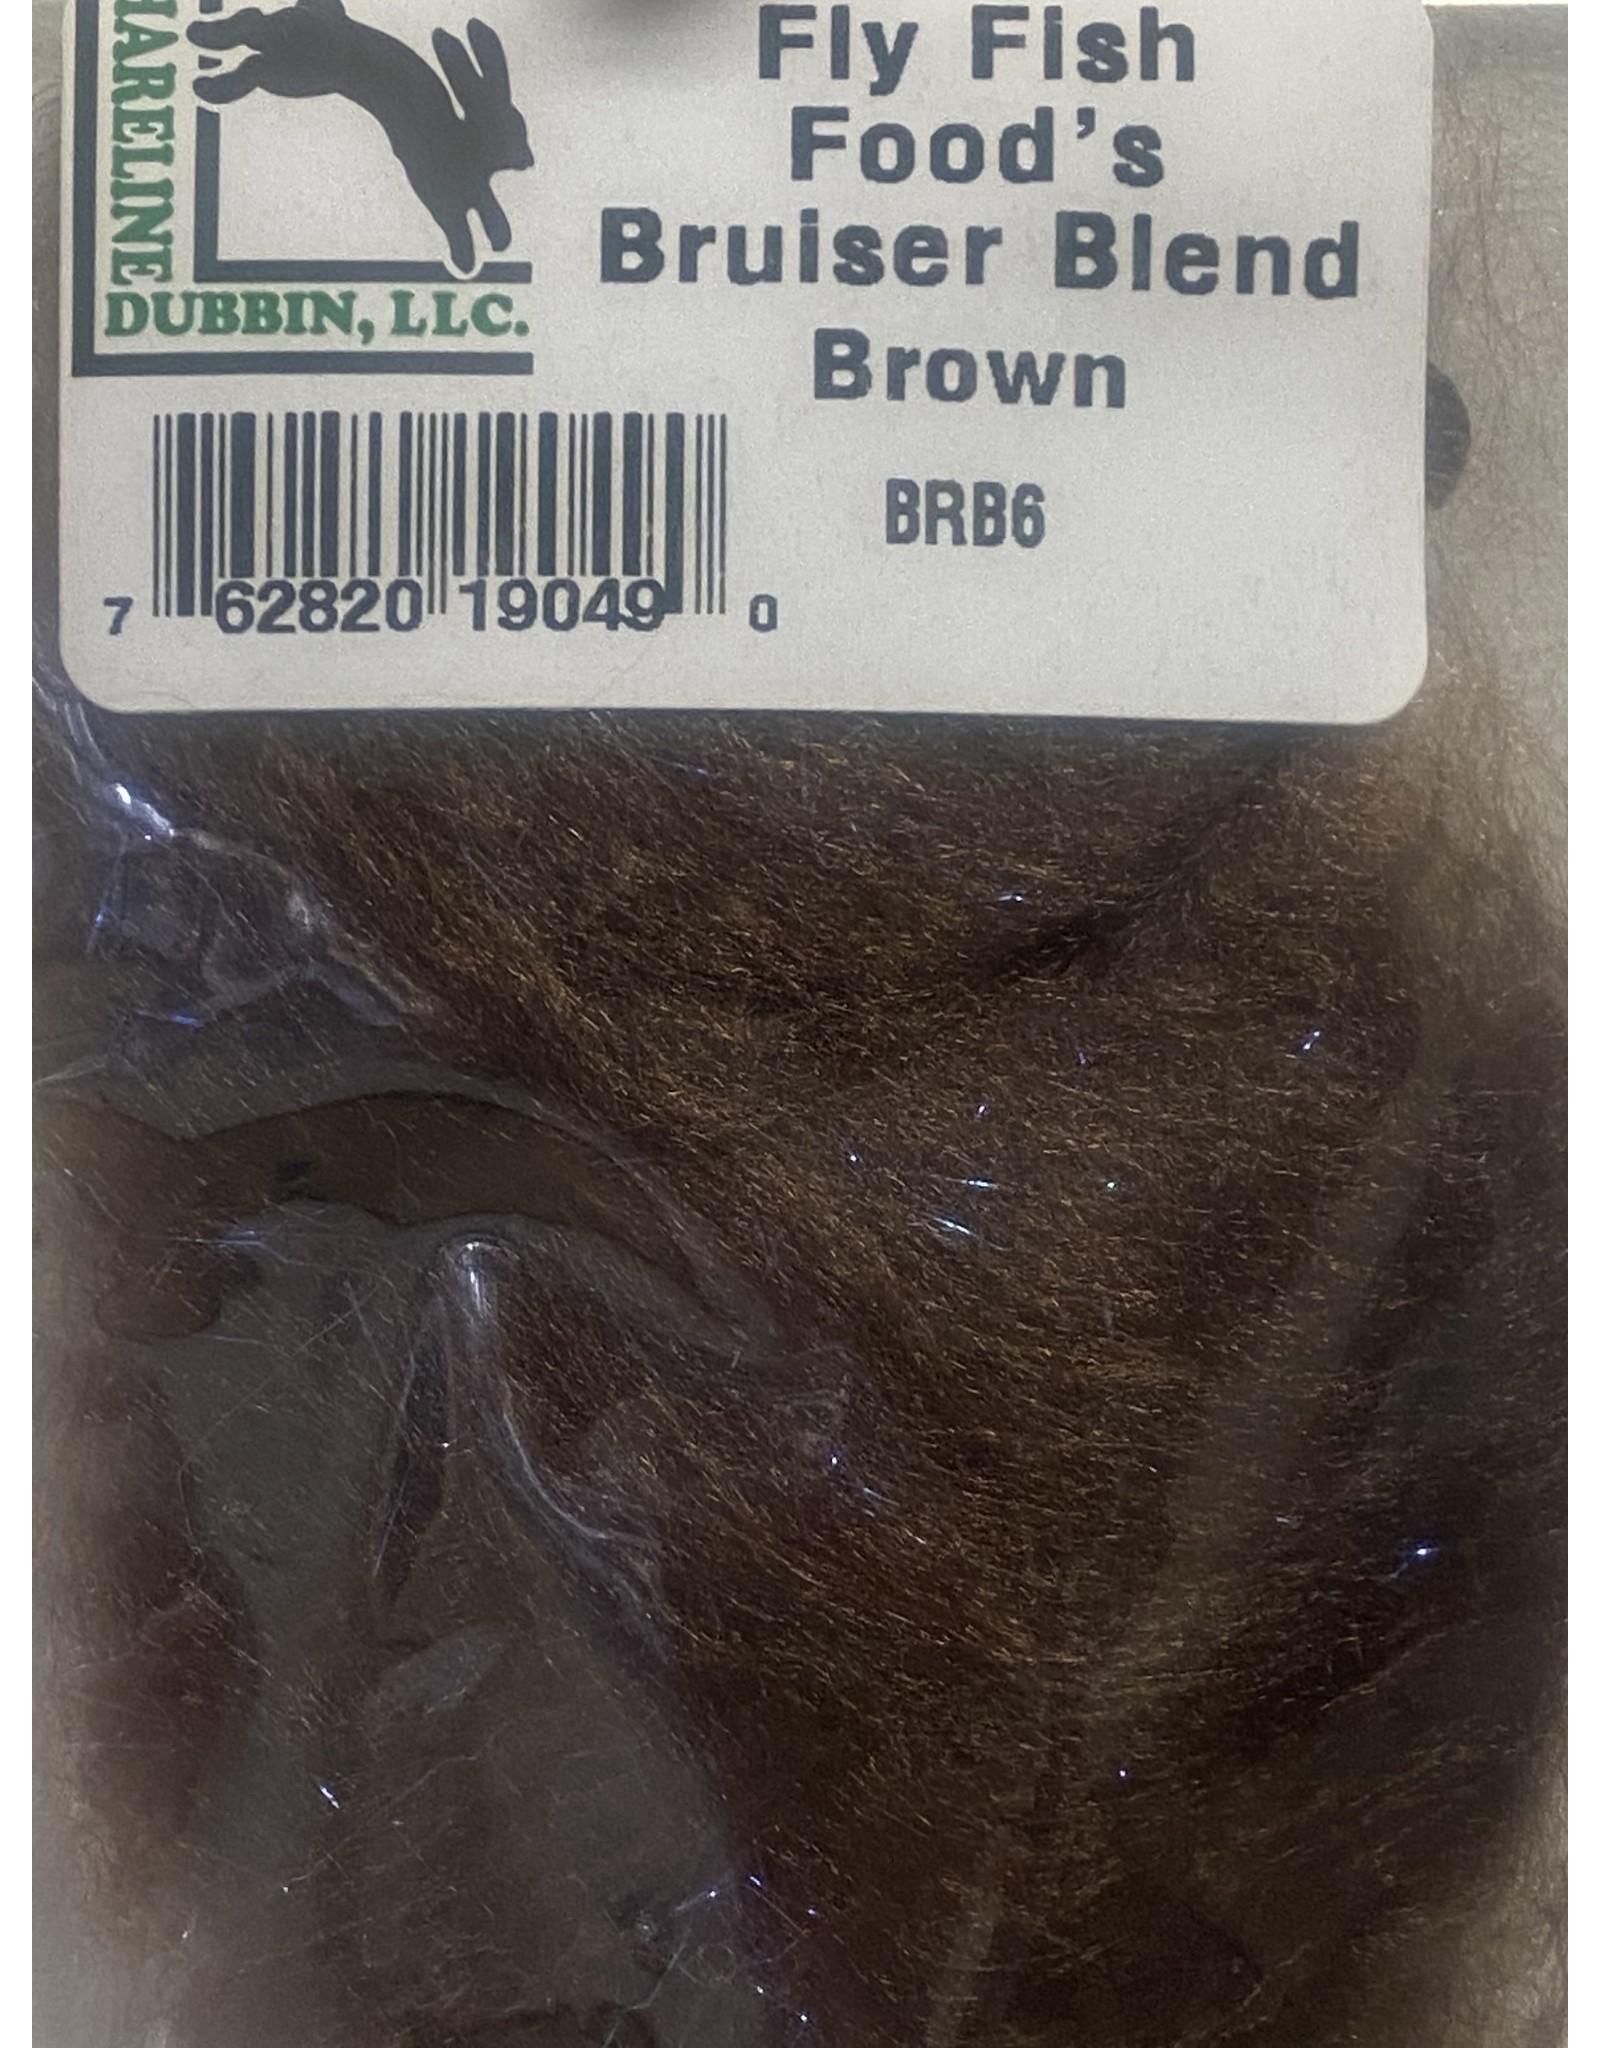 Hareline Fly Fish Food's Bruiser Blend #6 Brown